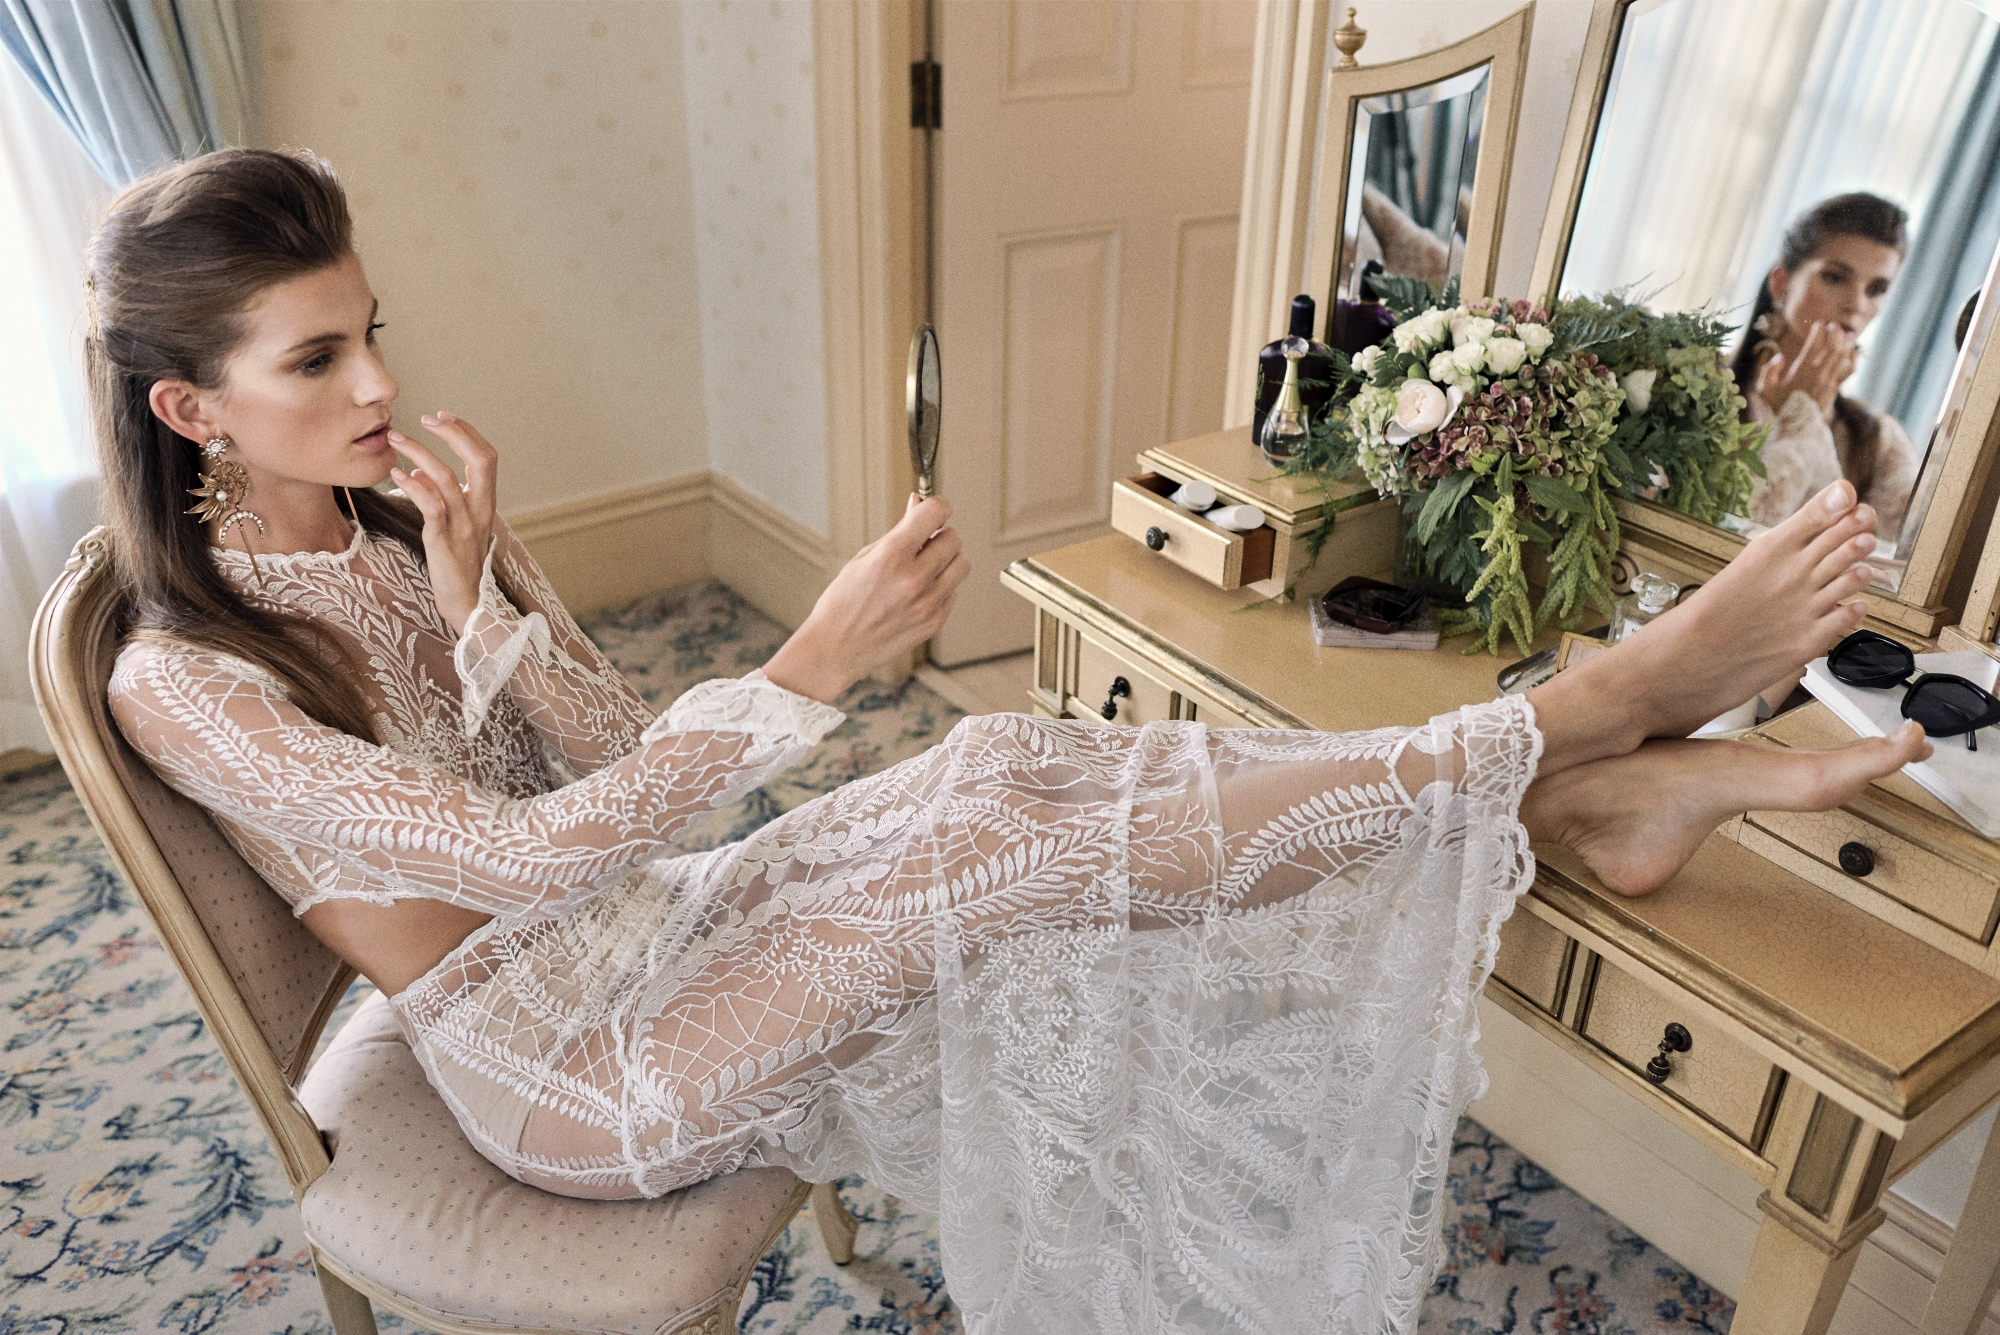 Sephory Photography-Her Morning Elegance Print 039 (2000x1335)